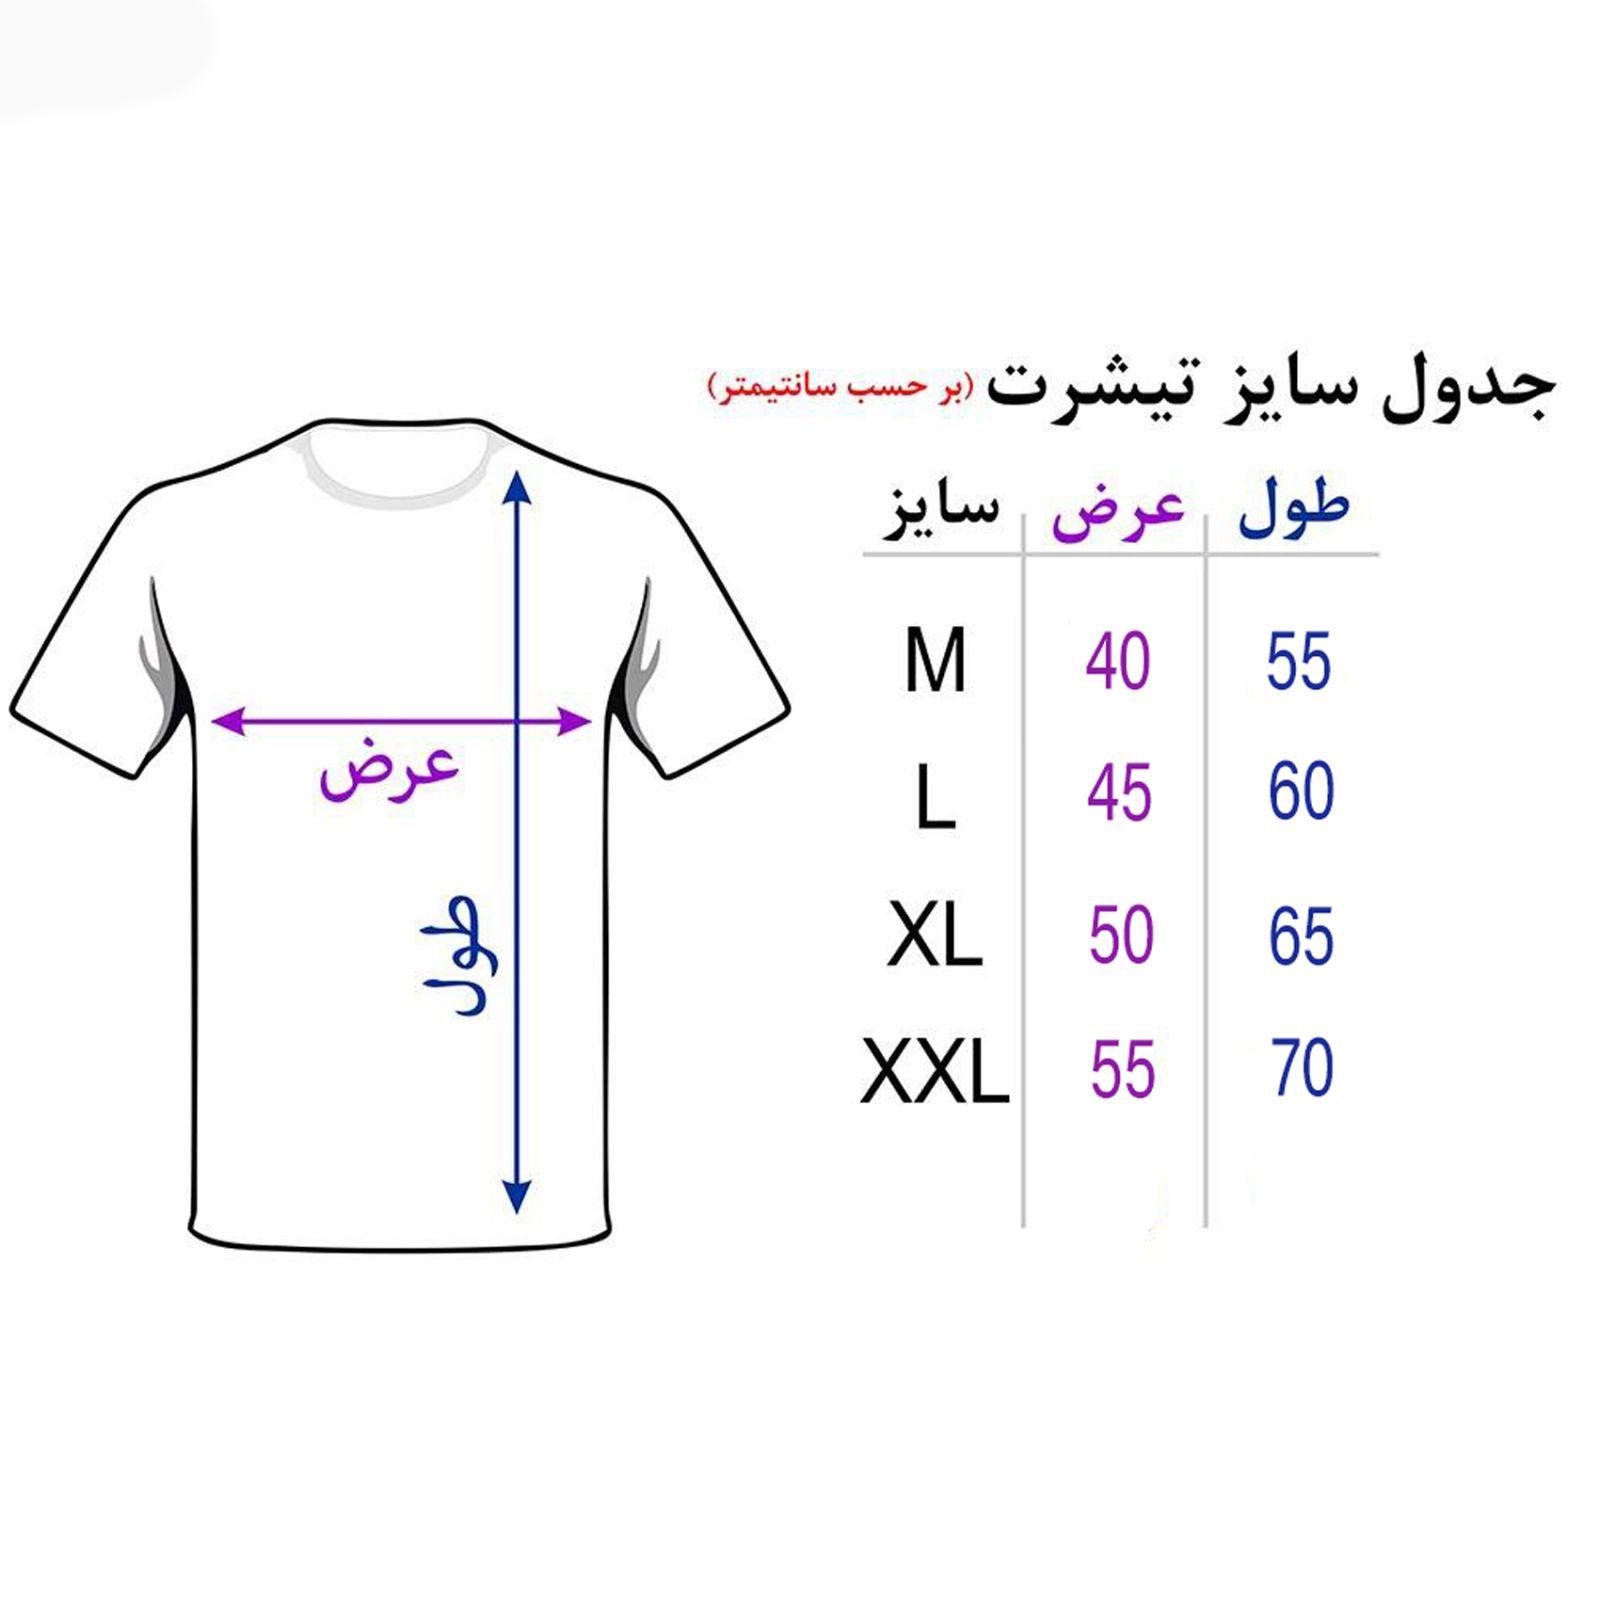 تیشرت مردانه 27 طرح خلیج فارس کد H08 -  - 5